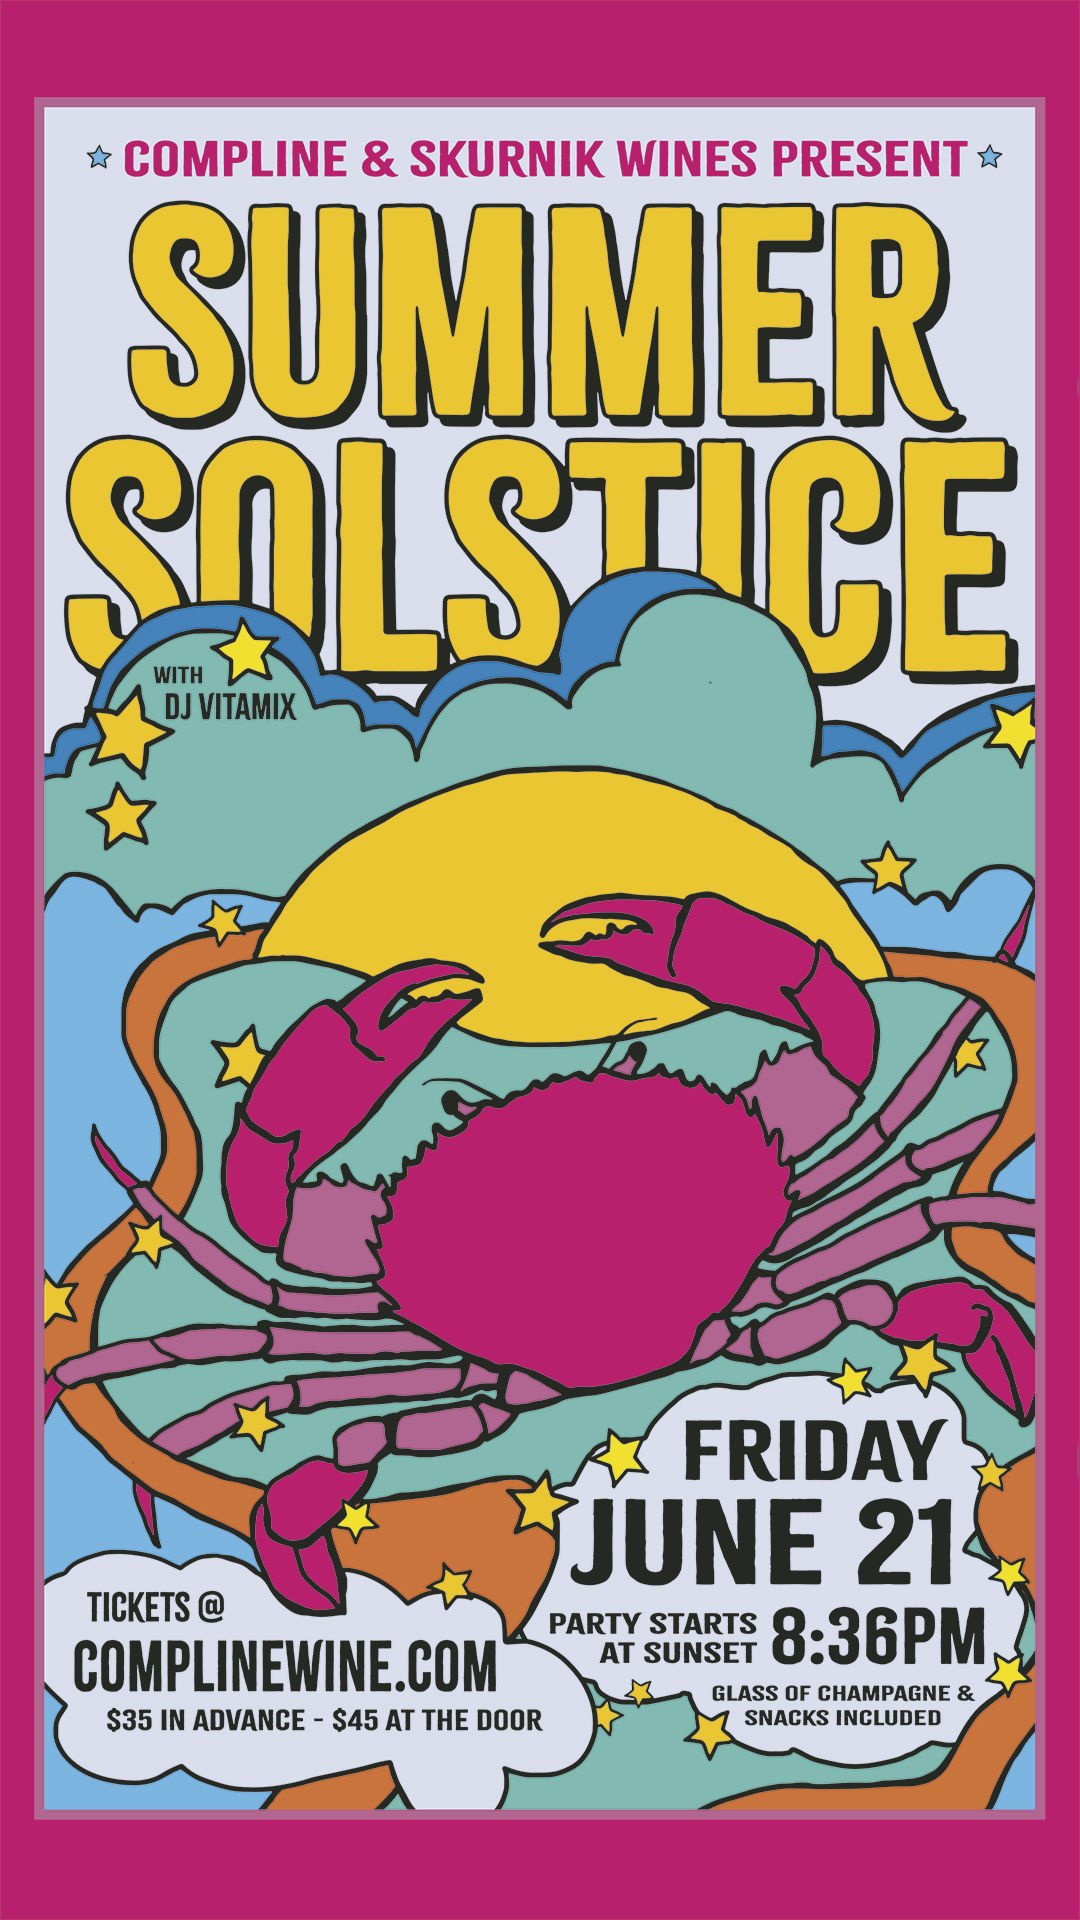 Compline Summer Solstice Party